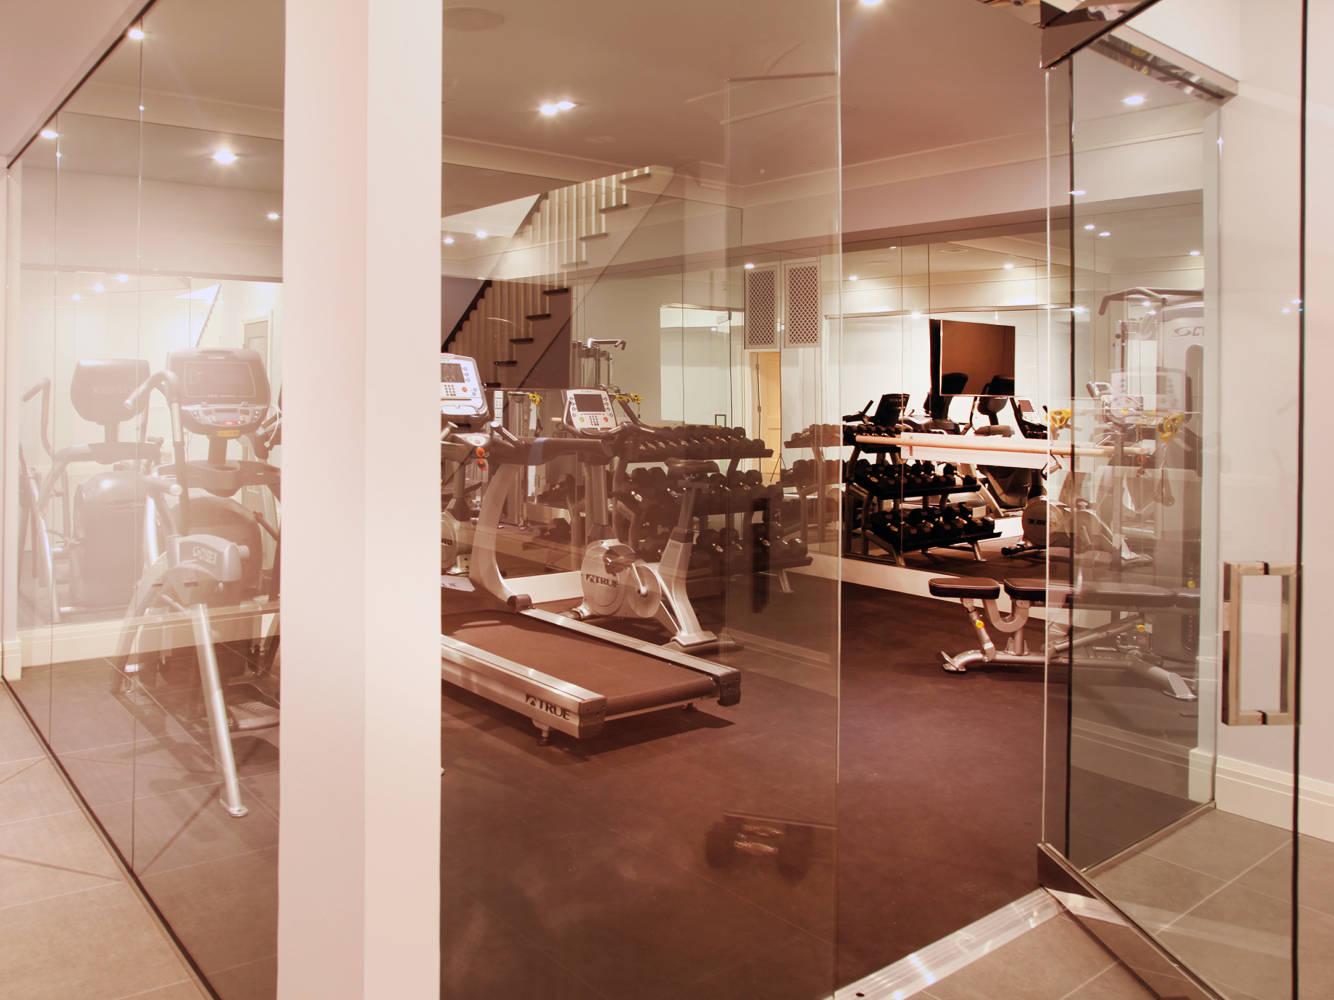 27-es-bay-gym